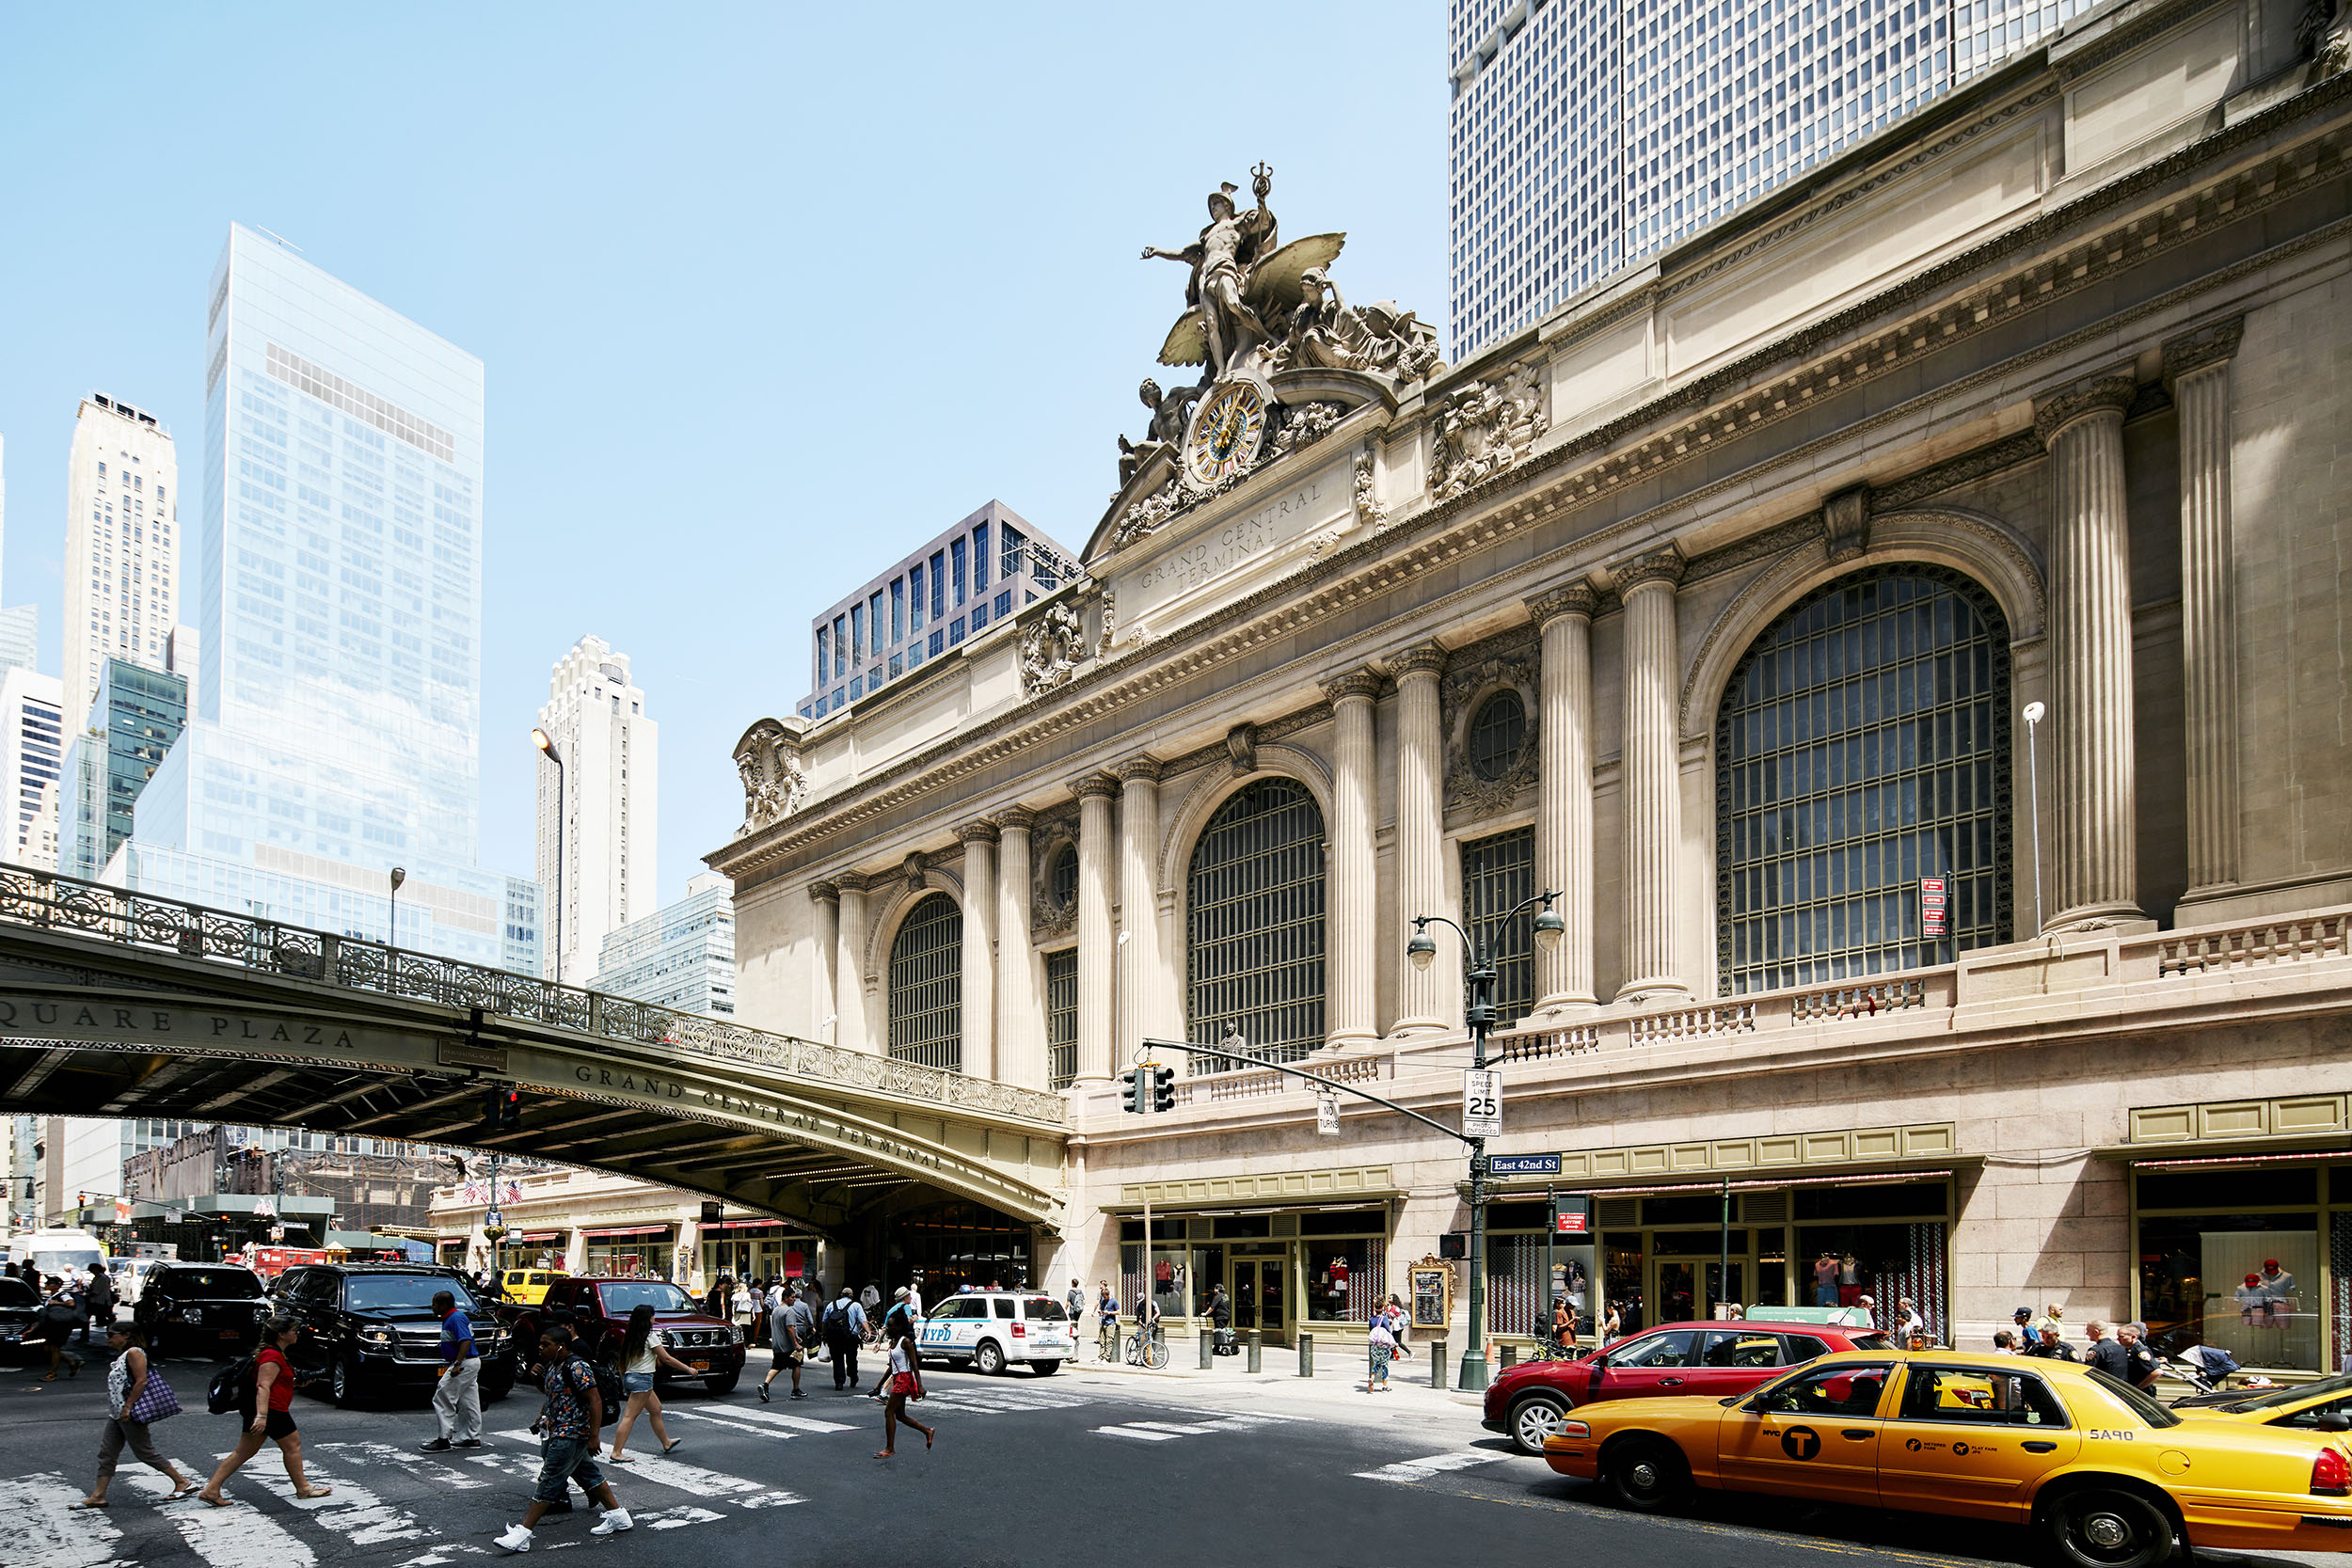 Club Quarters Hotel Grand Central - Midtown York City